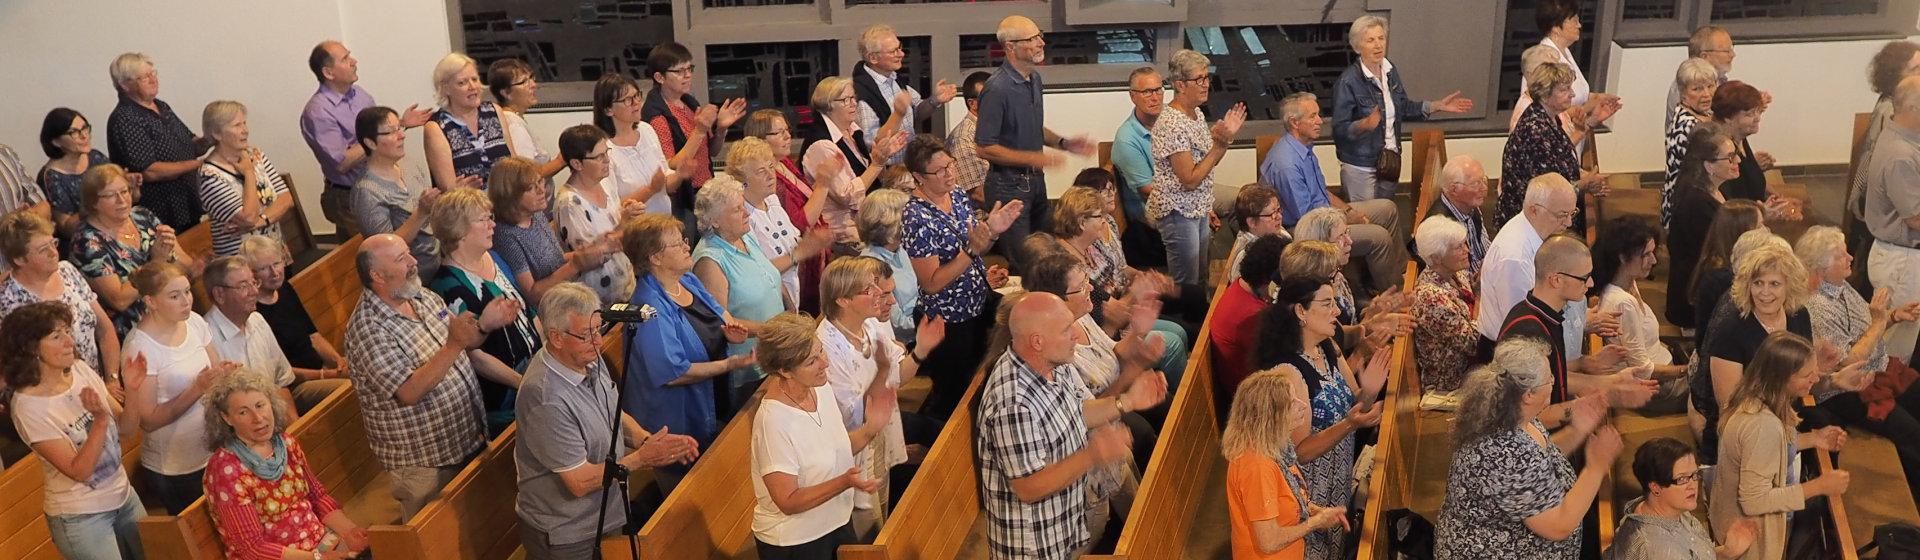 Konzert Klangfarben / Quelle: Ev. Kirche Wehr